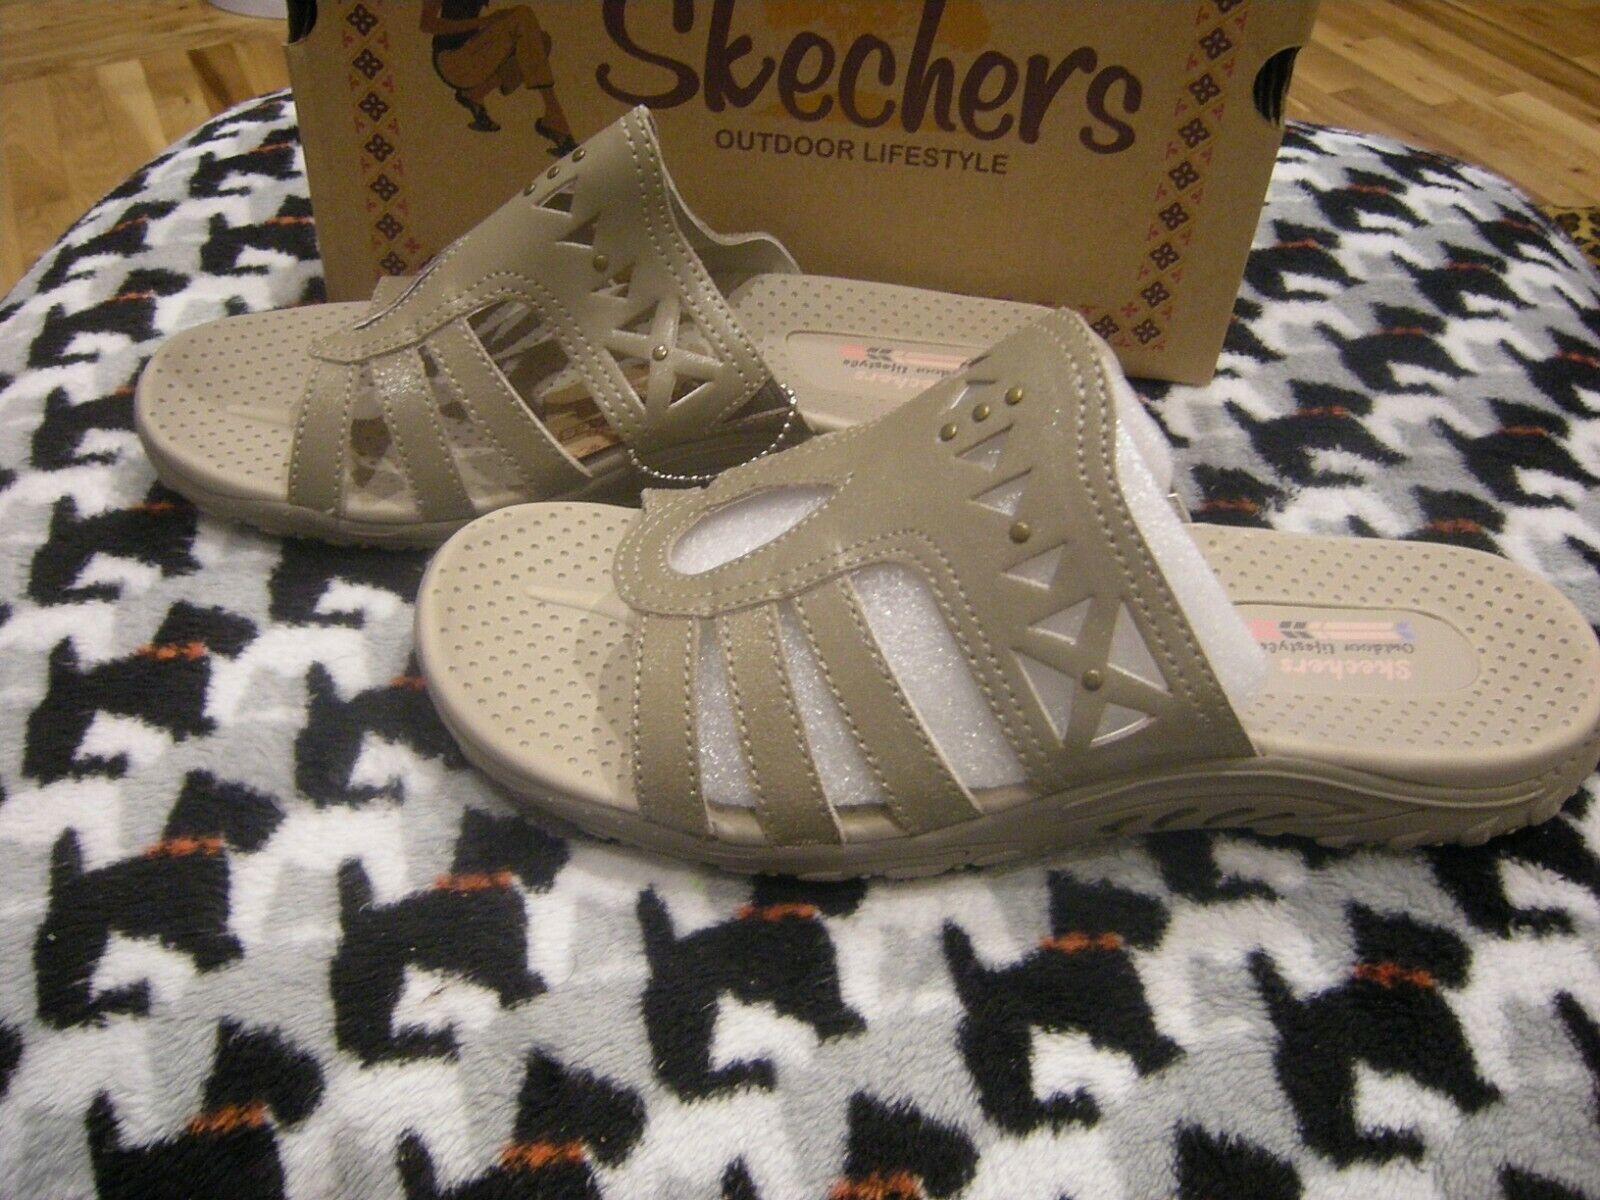 Brand New Womens Taupe Brown Skechers Azalea Sandals, Size 7